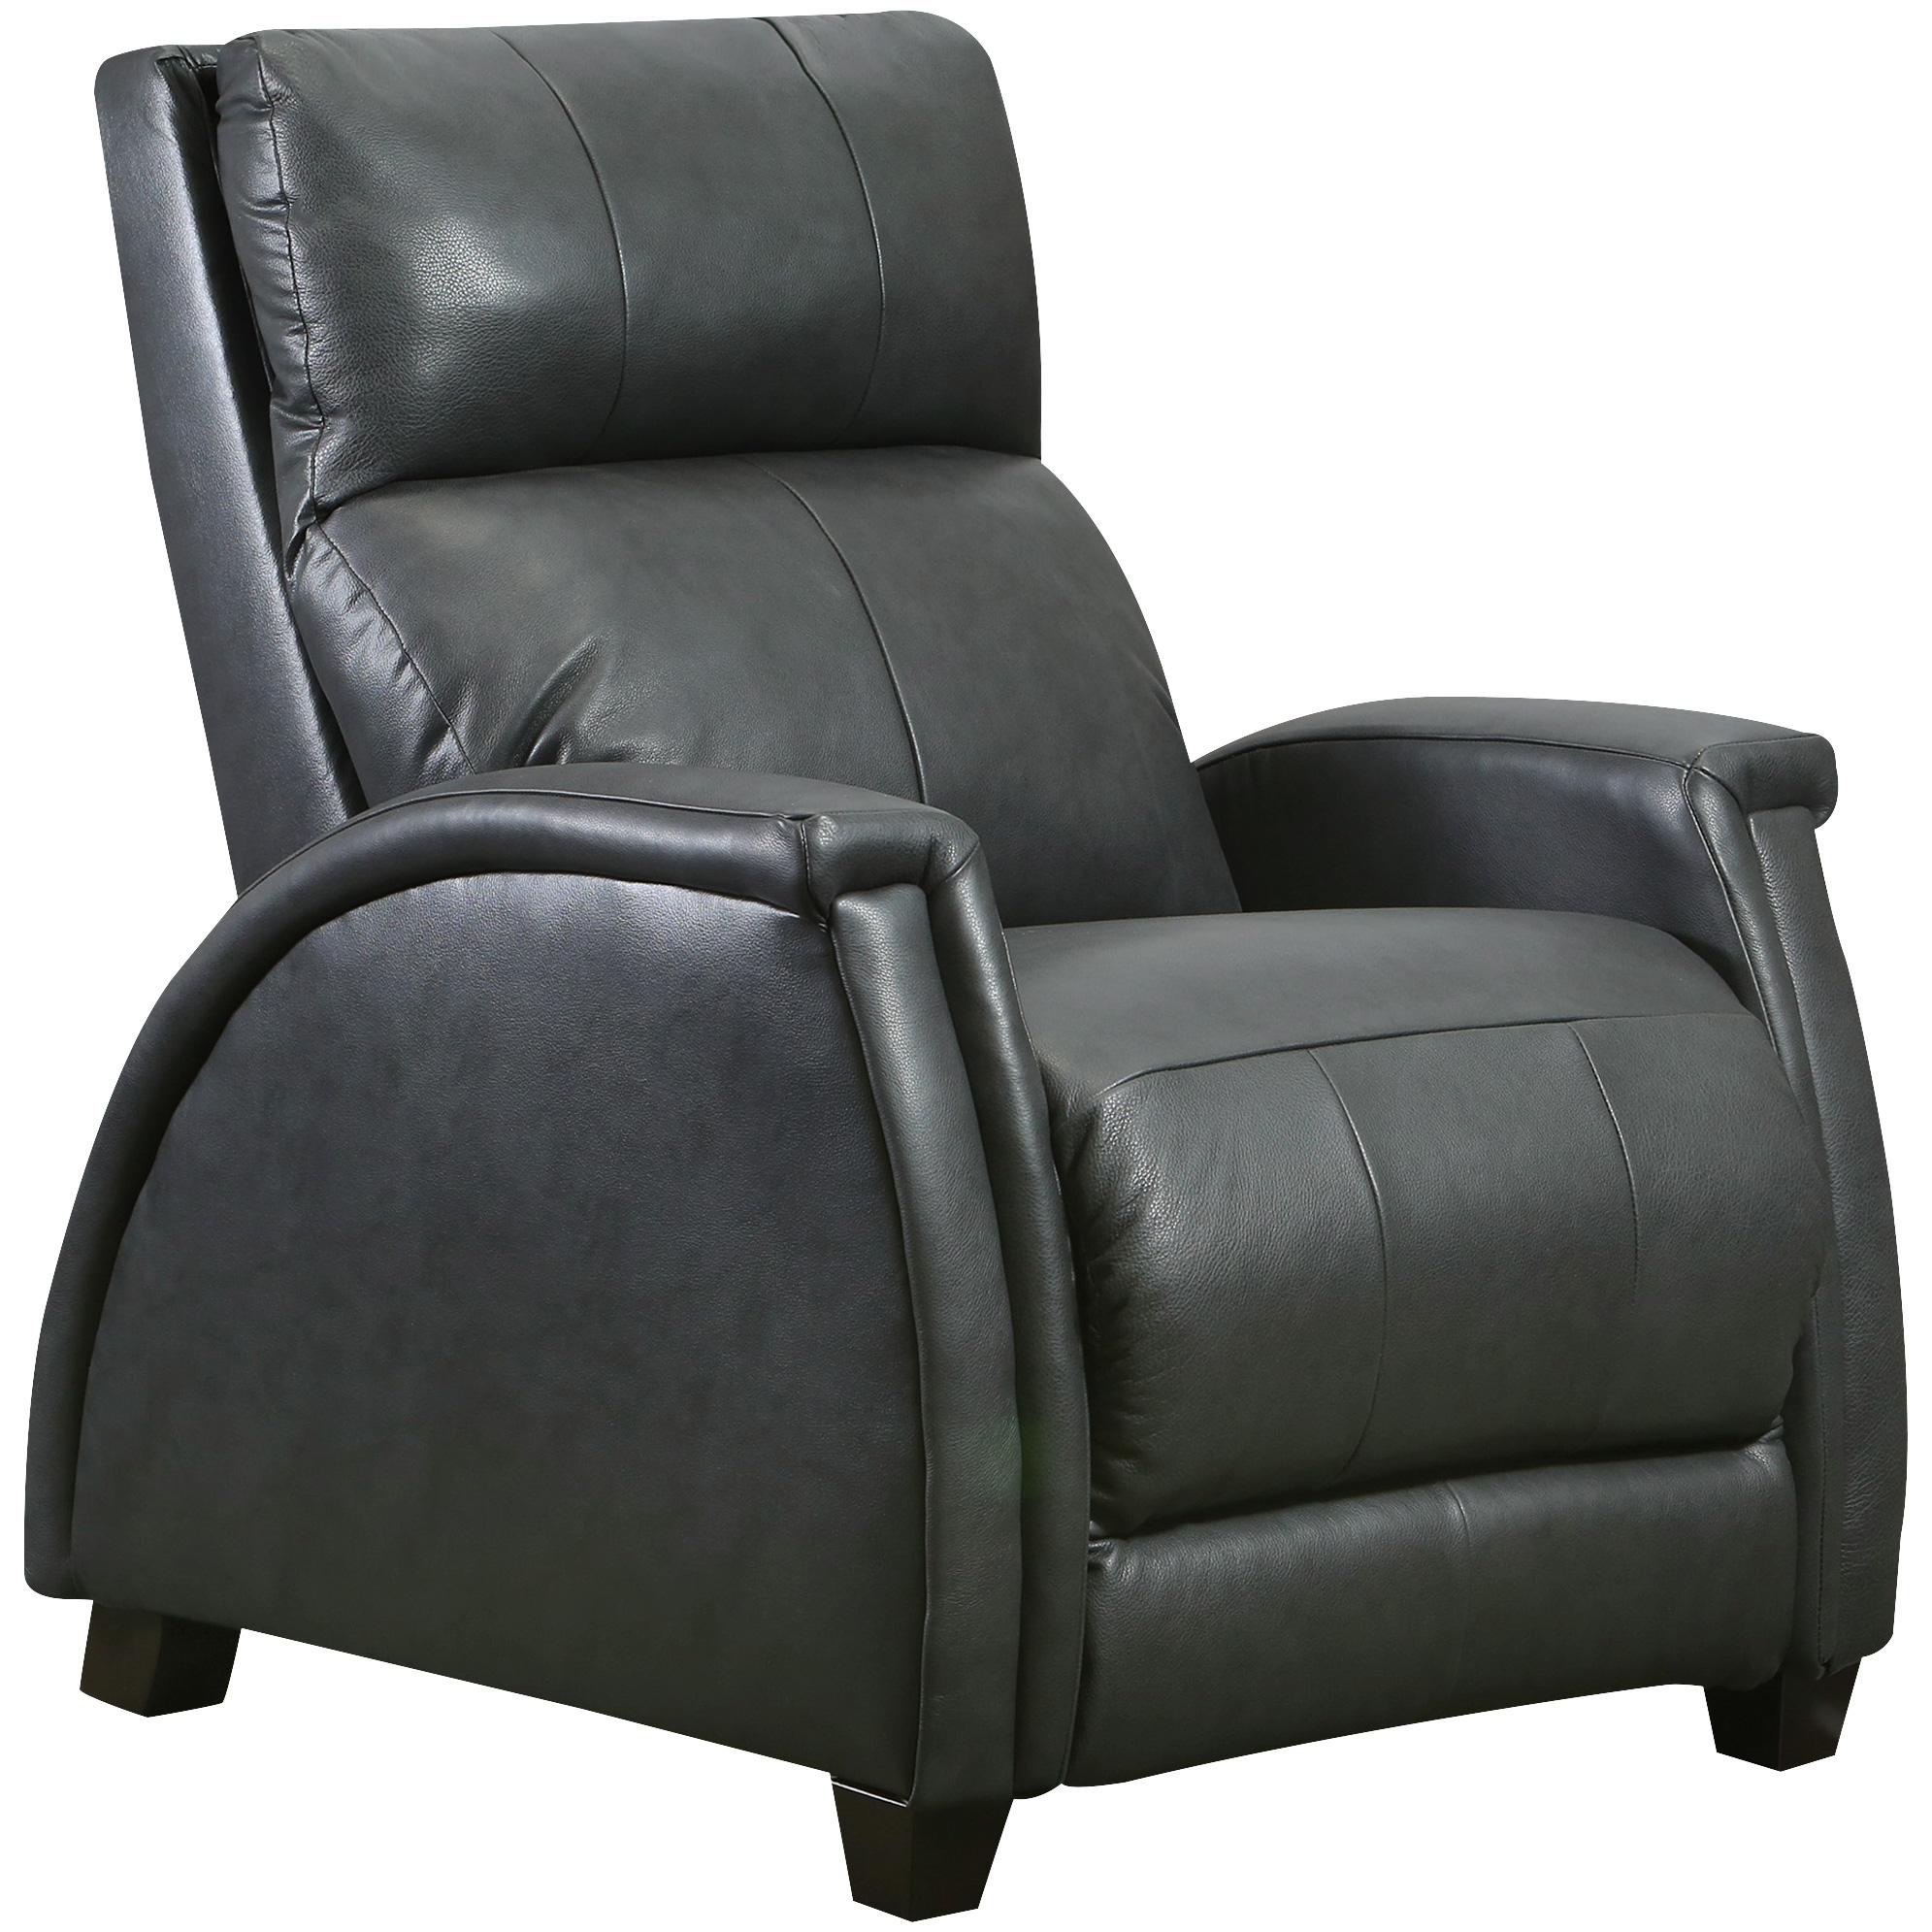 Southern Motion | Venus Graphite Zero Gravity Power+ Leather Leg Recliner Chair